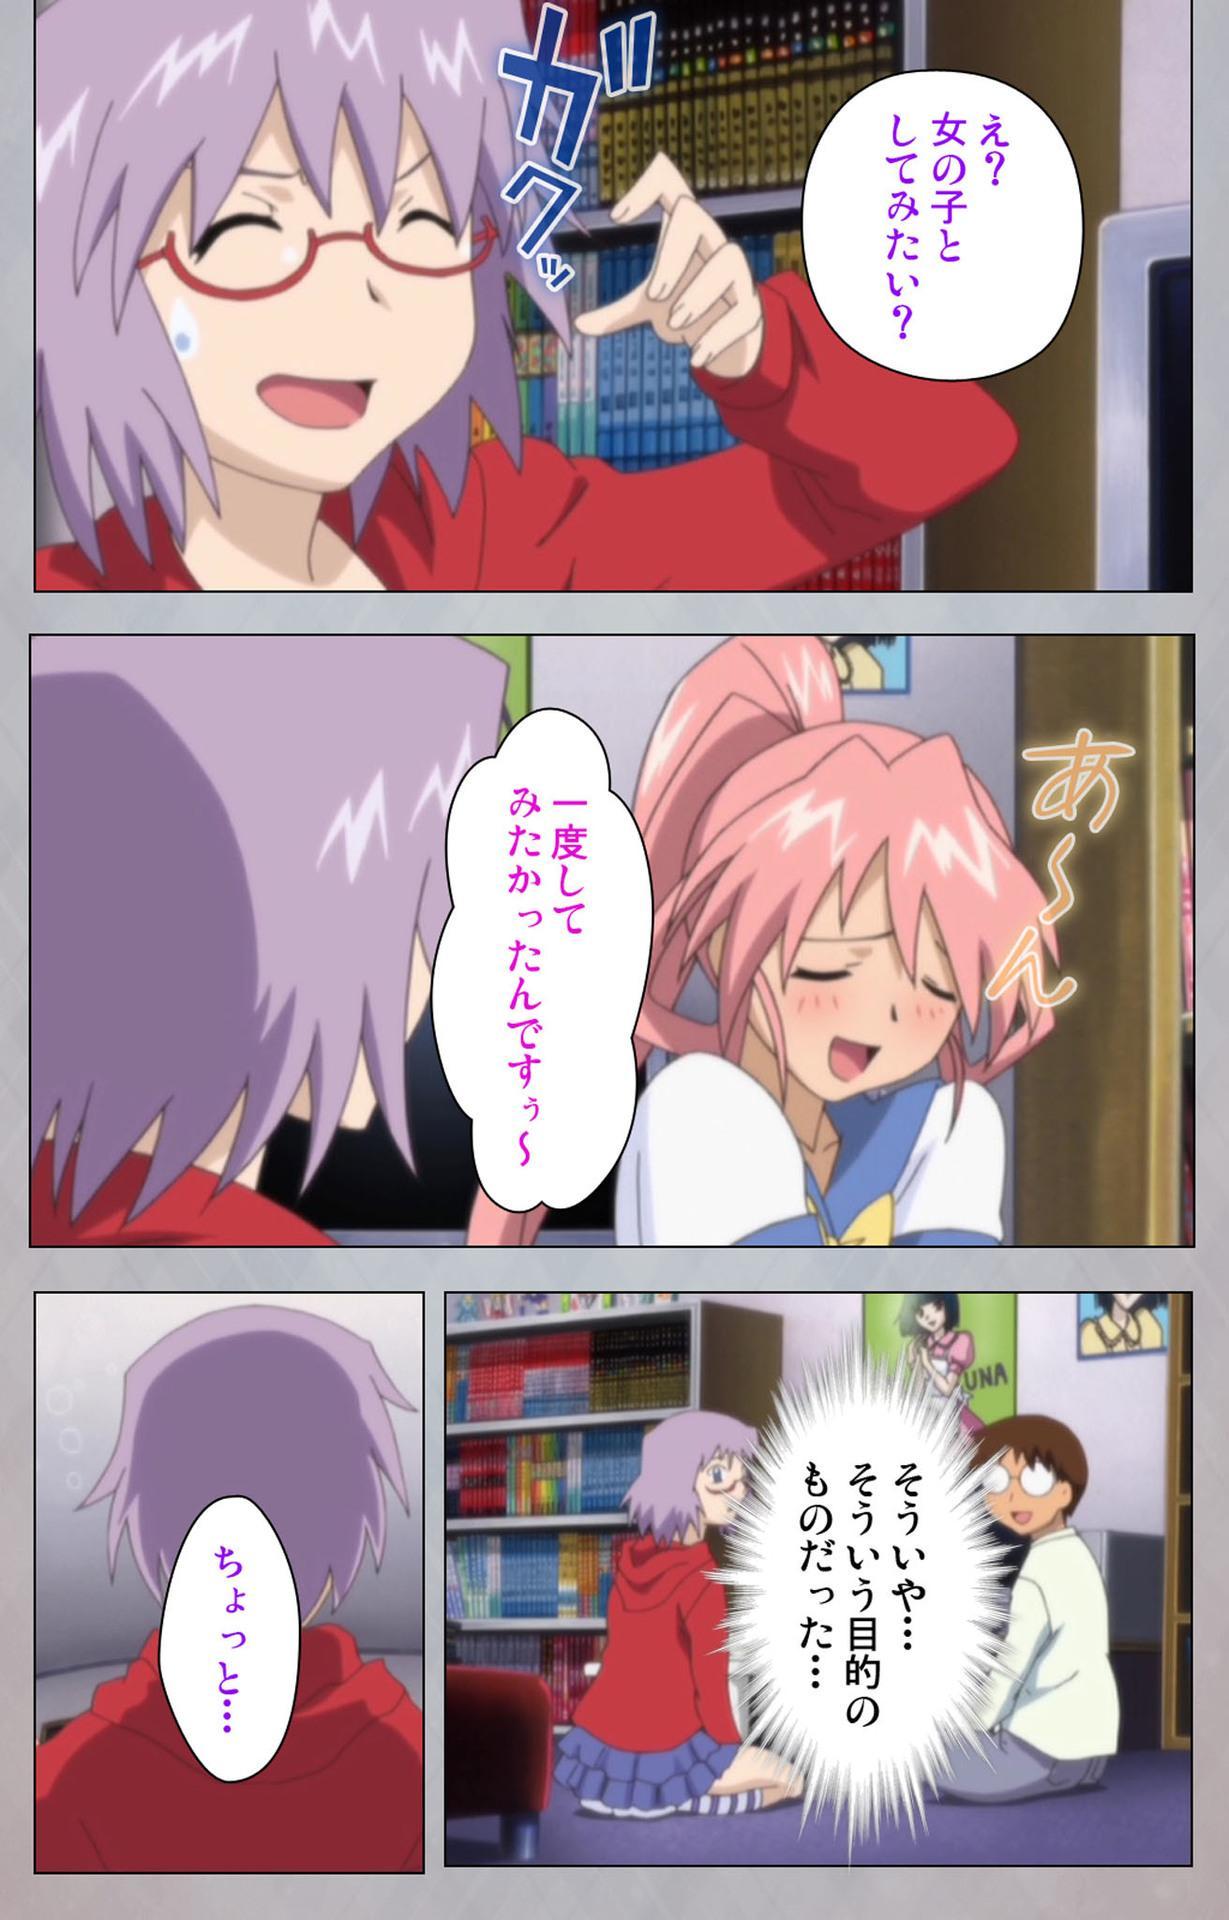 [Digital Works] [Full Color Seijin Ban] Sex Android ~Risou no Onna de Nuite yaru~ Kanzenban 196